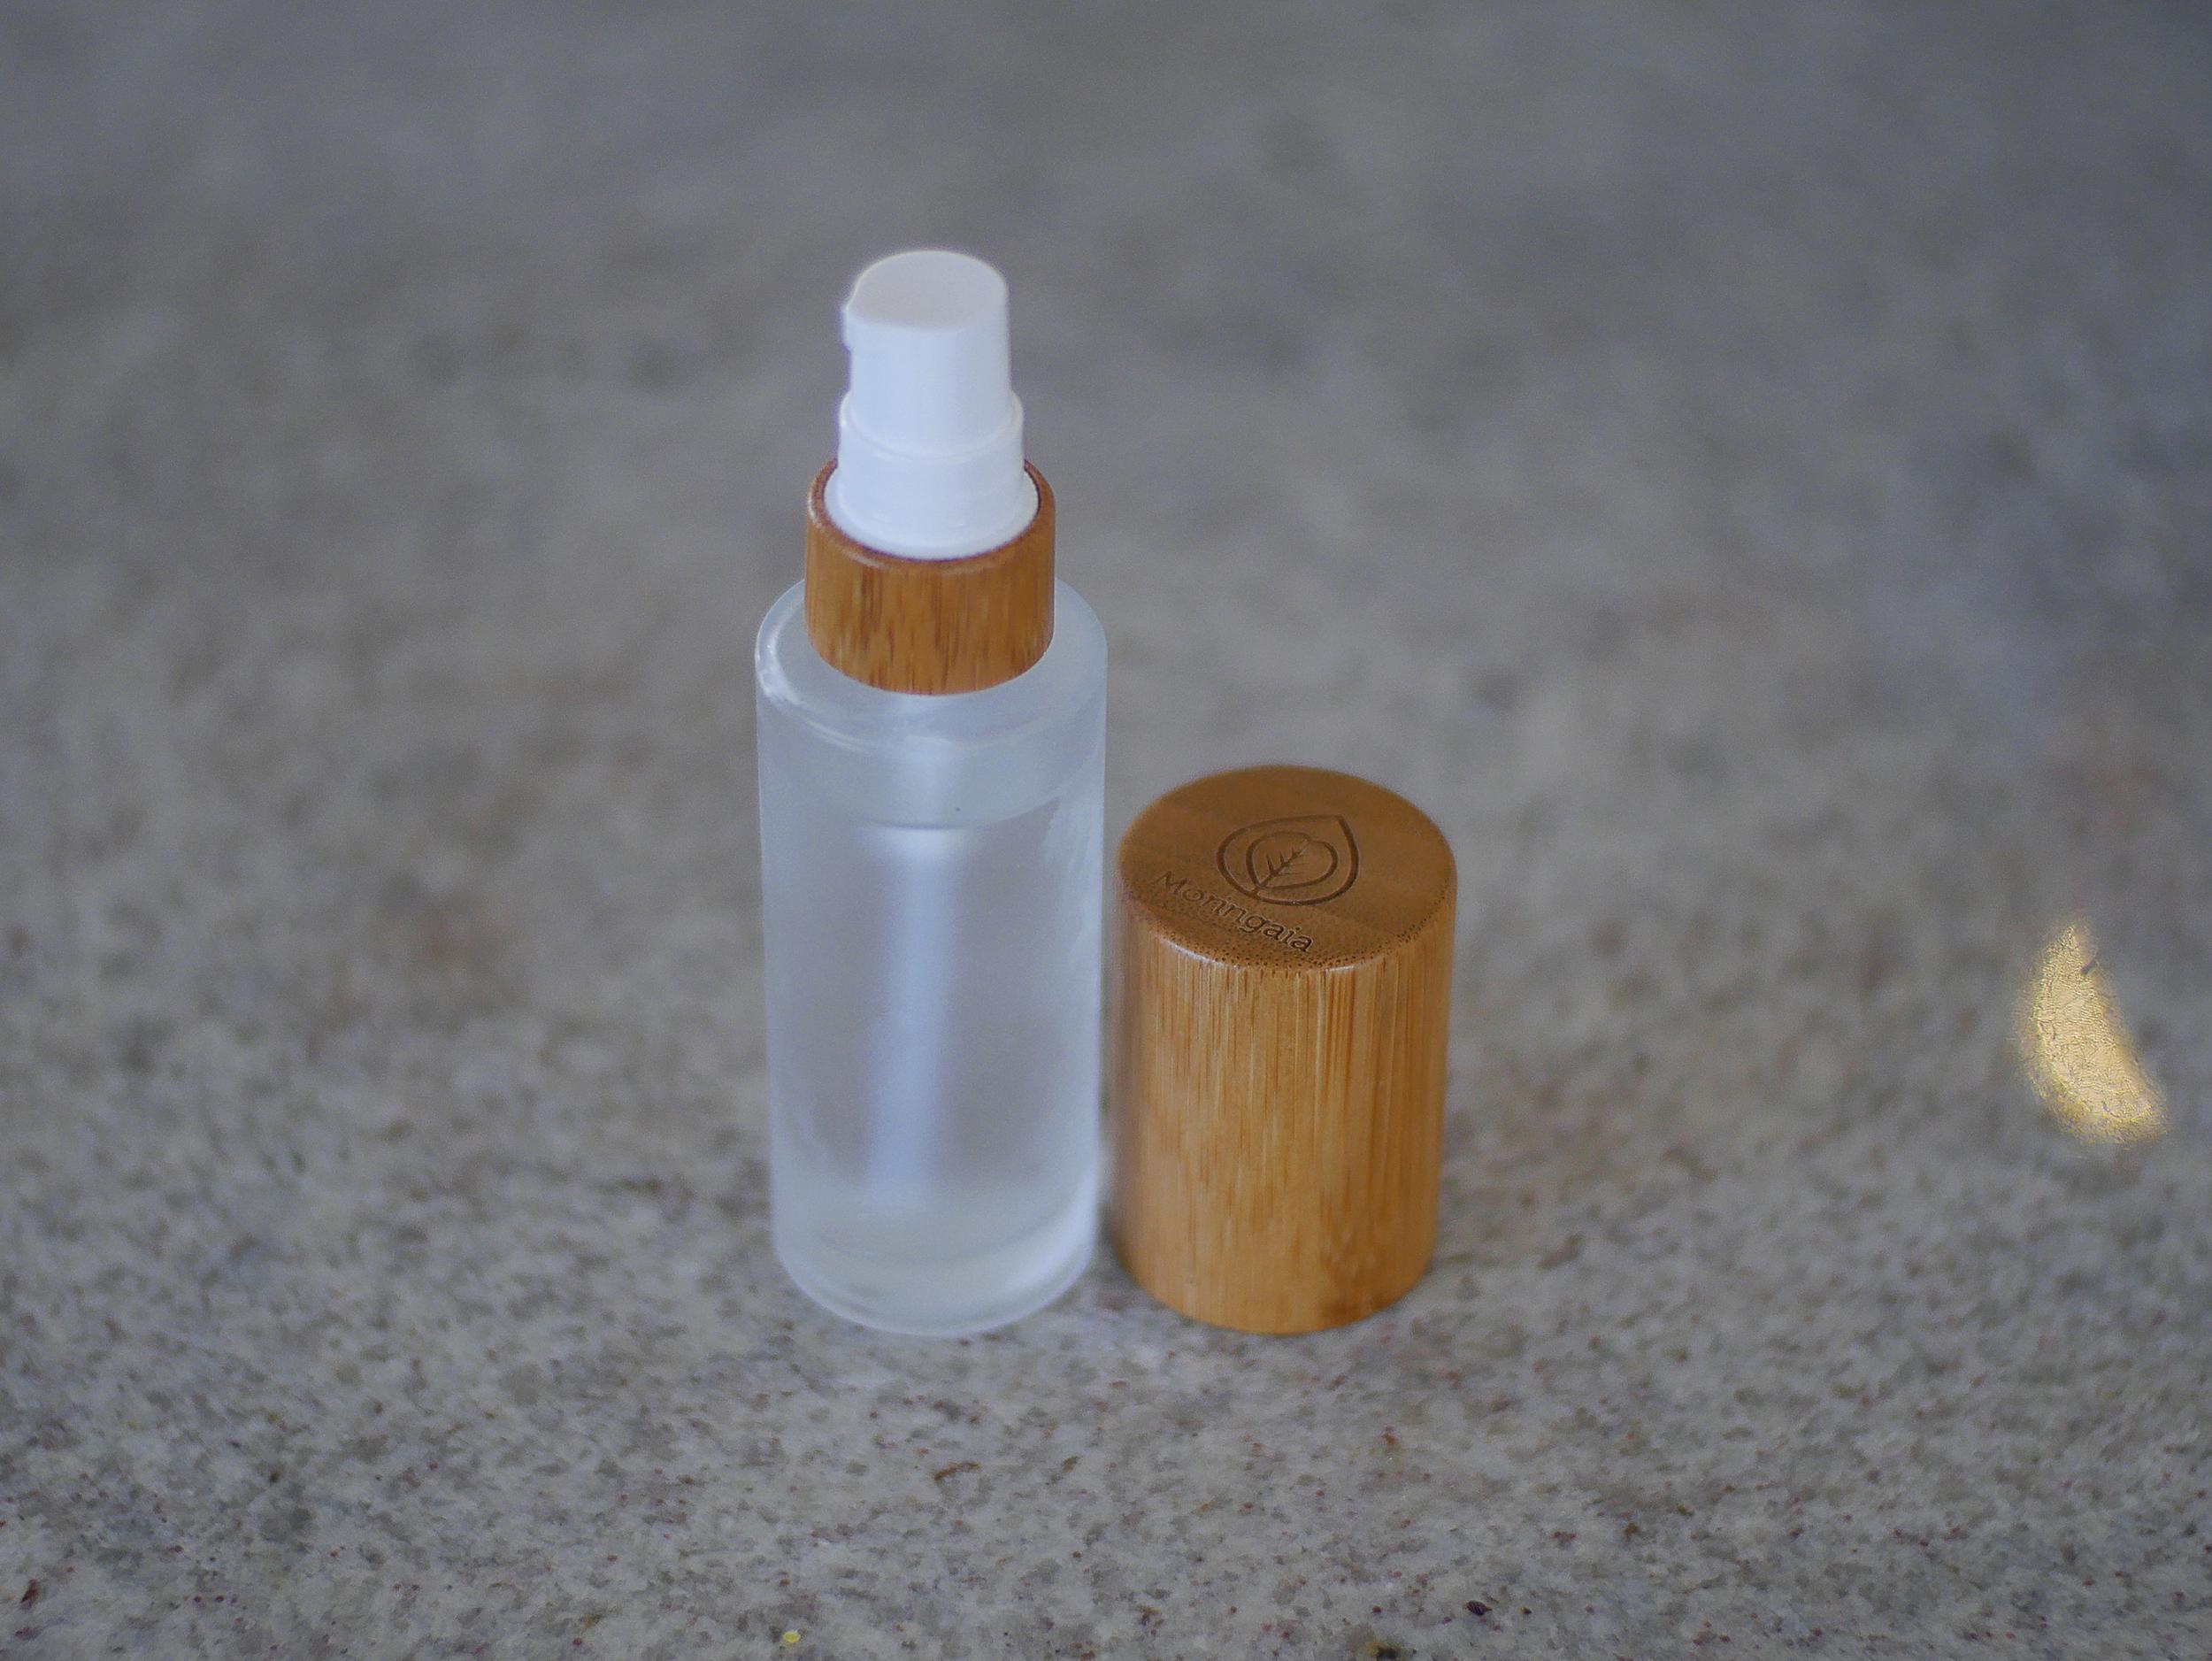 moringaia_bottles3_2500px-web.jpg